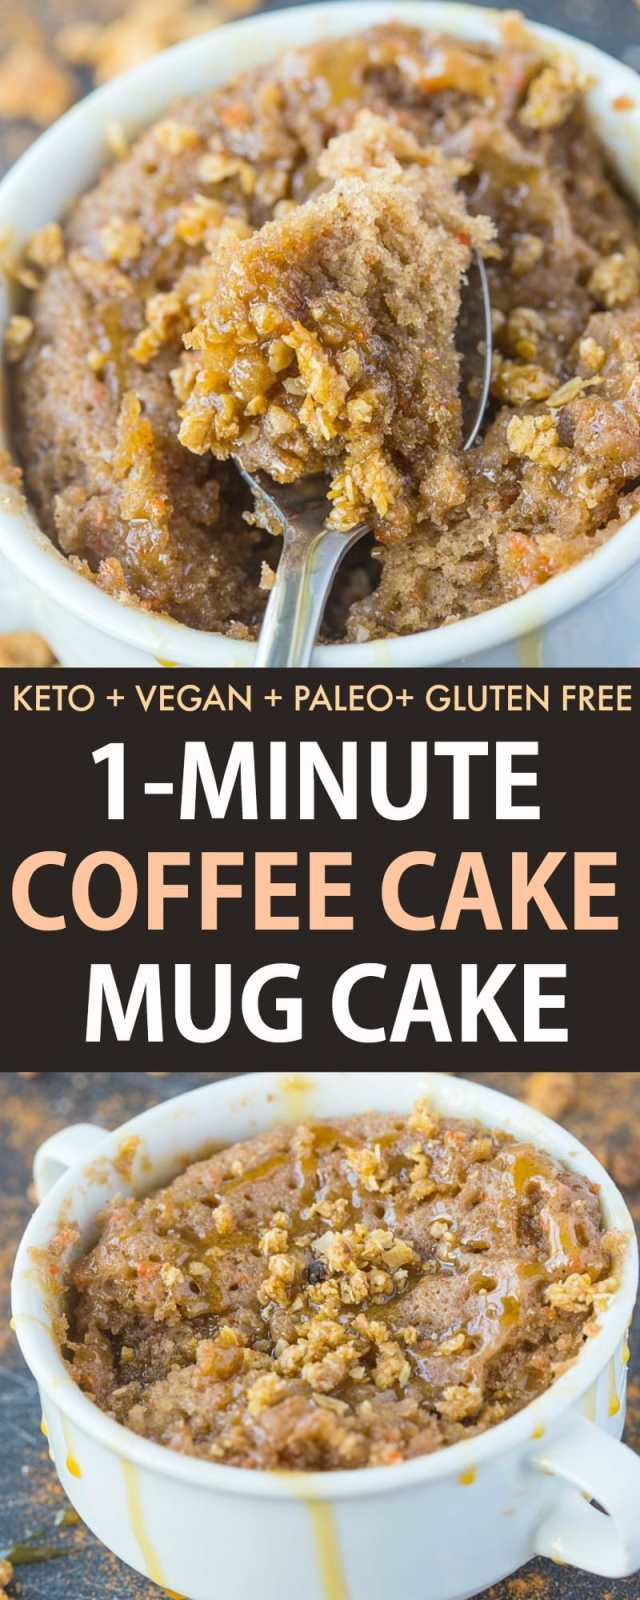 healthy single serving coffee cake in a mug. Paleo, keto and vegan